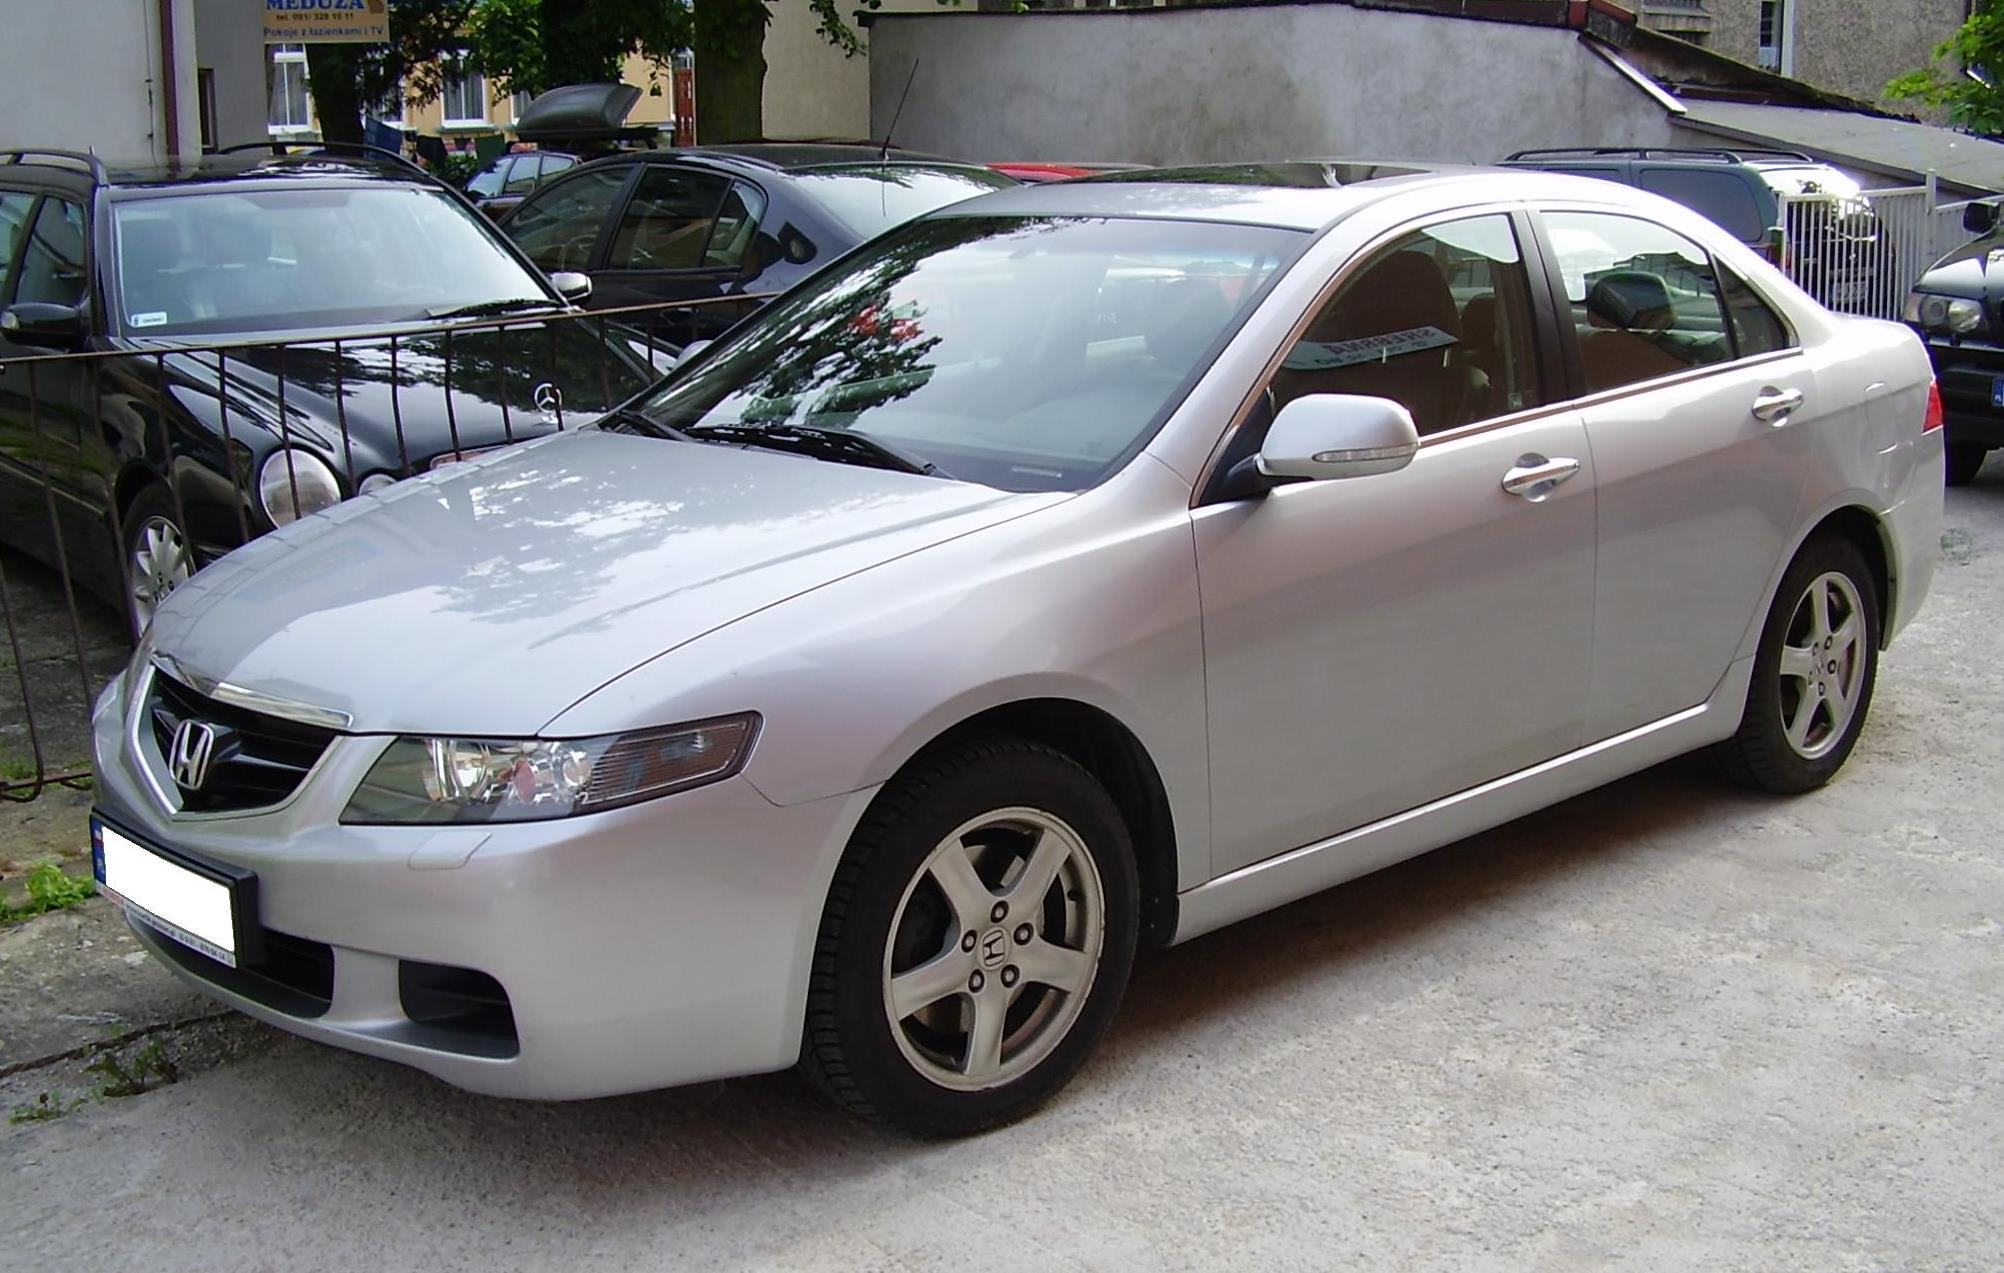 Honda Civic Eighth Generation Wikipedia | 2017 - 2018 Cars ...